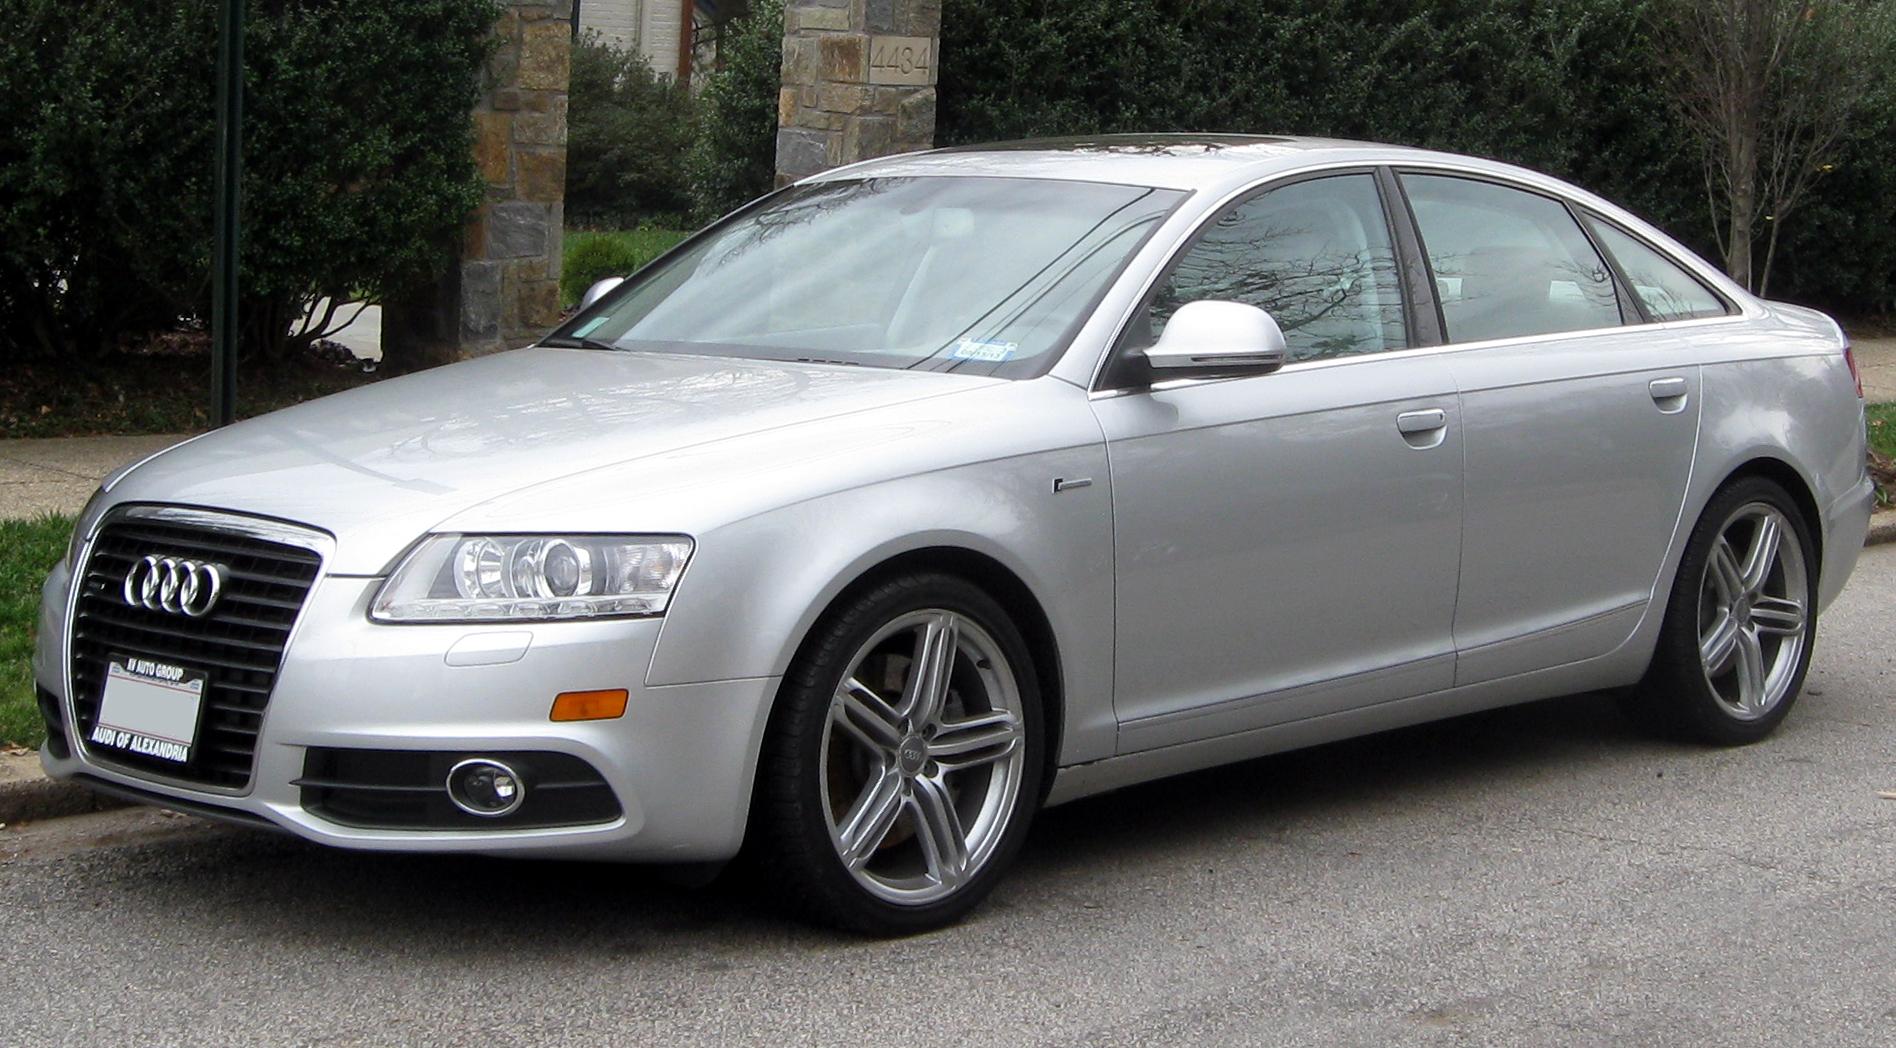 2009 Audi A6 Image 18